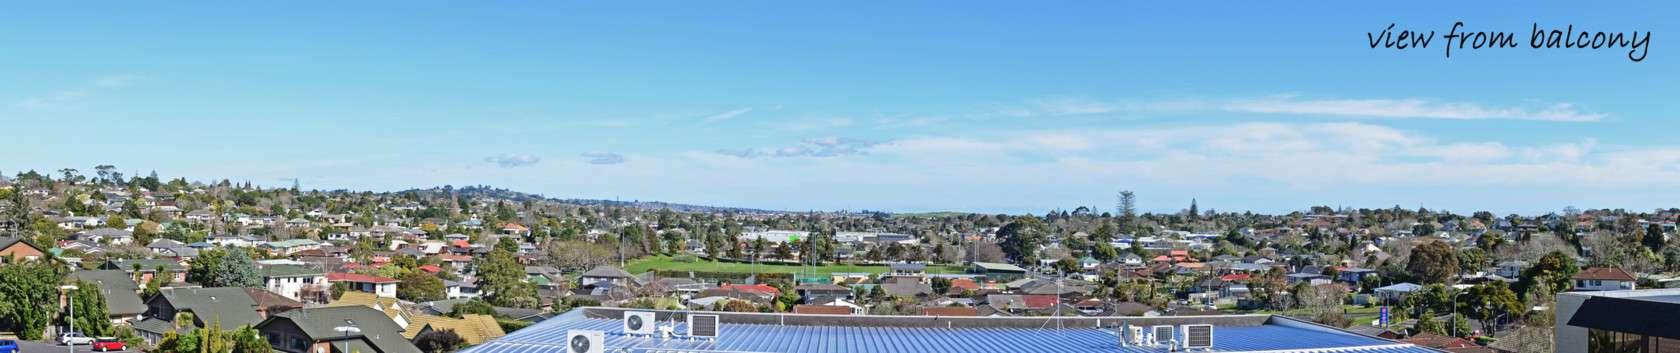 209/24 Wellington Street, Howick, Manukau City 2014 - Sold